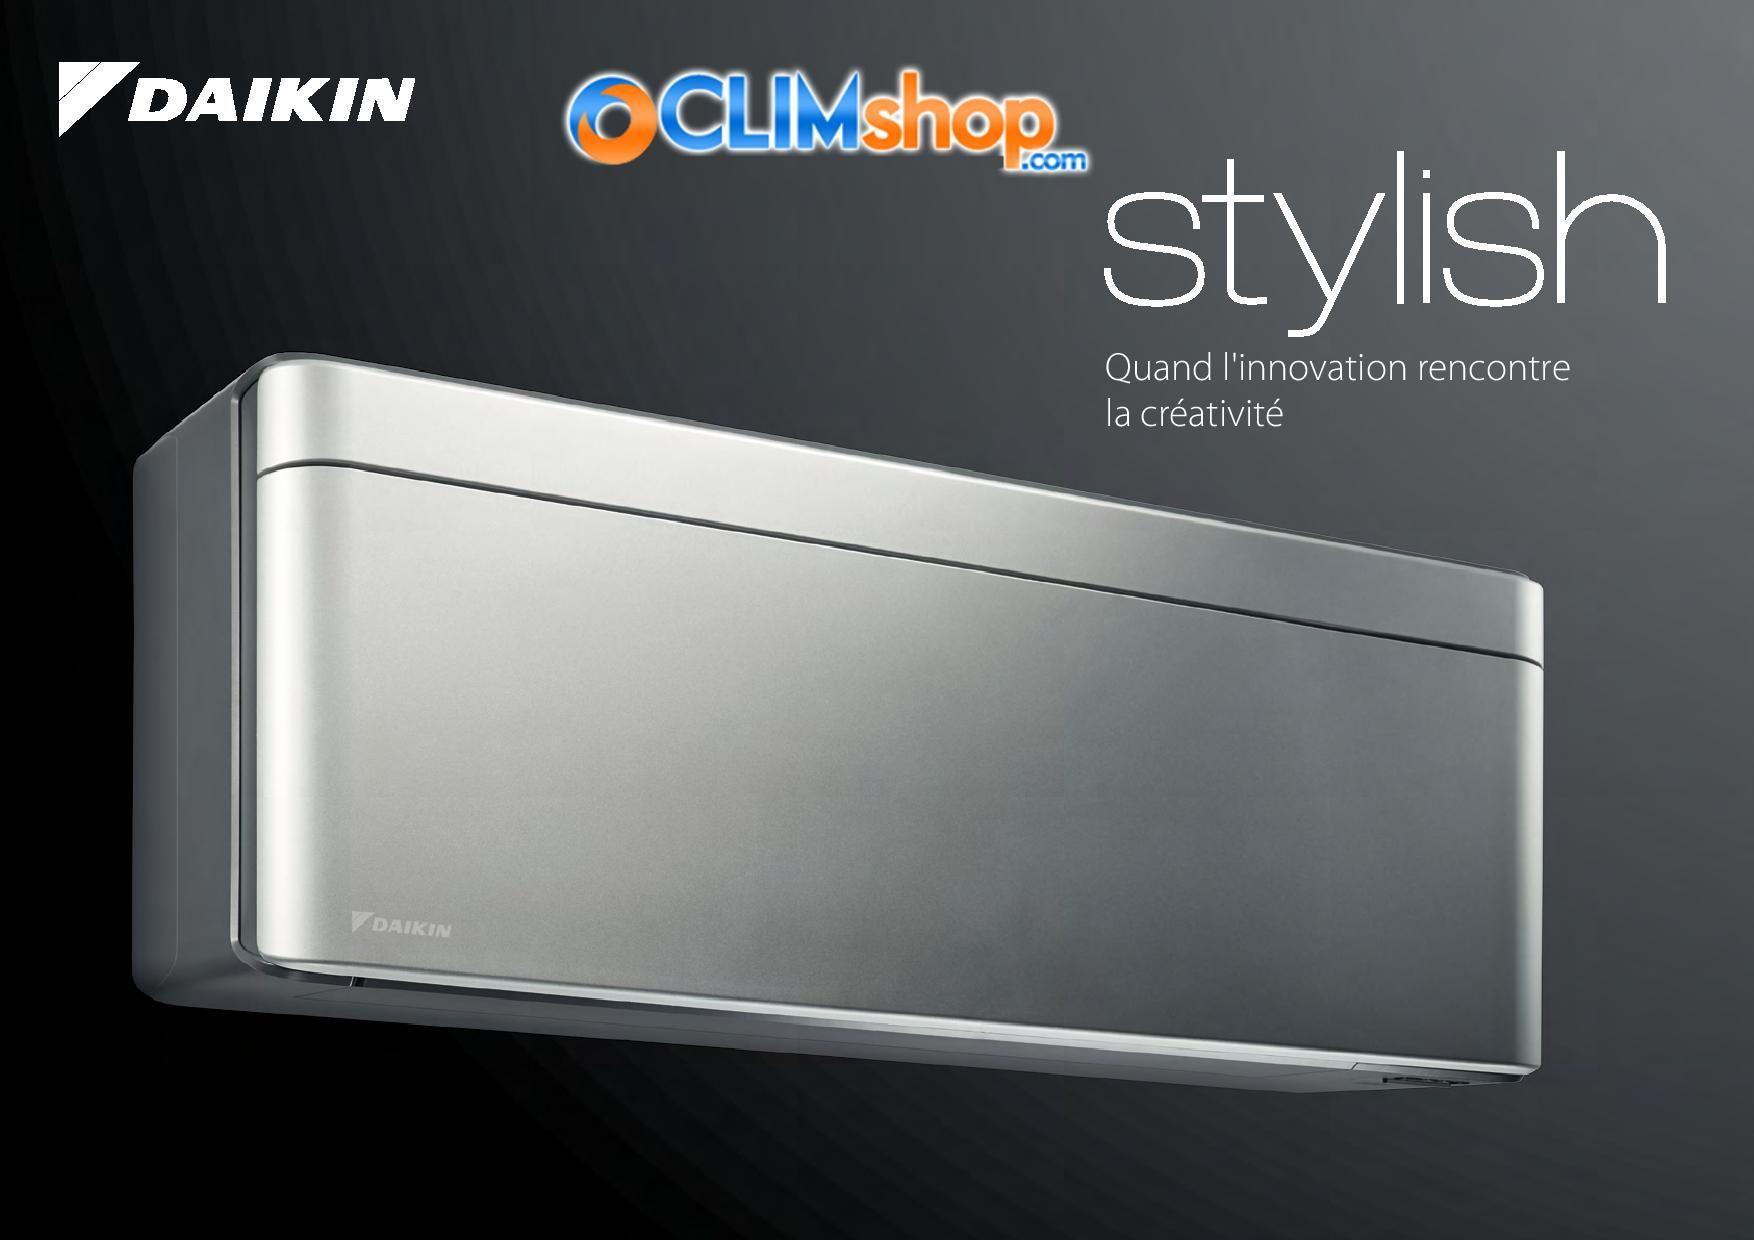 Documentation Climatiseur Daikin Stylish R32 Bluevolution Climatiseur Climatisation Innovation